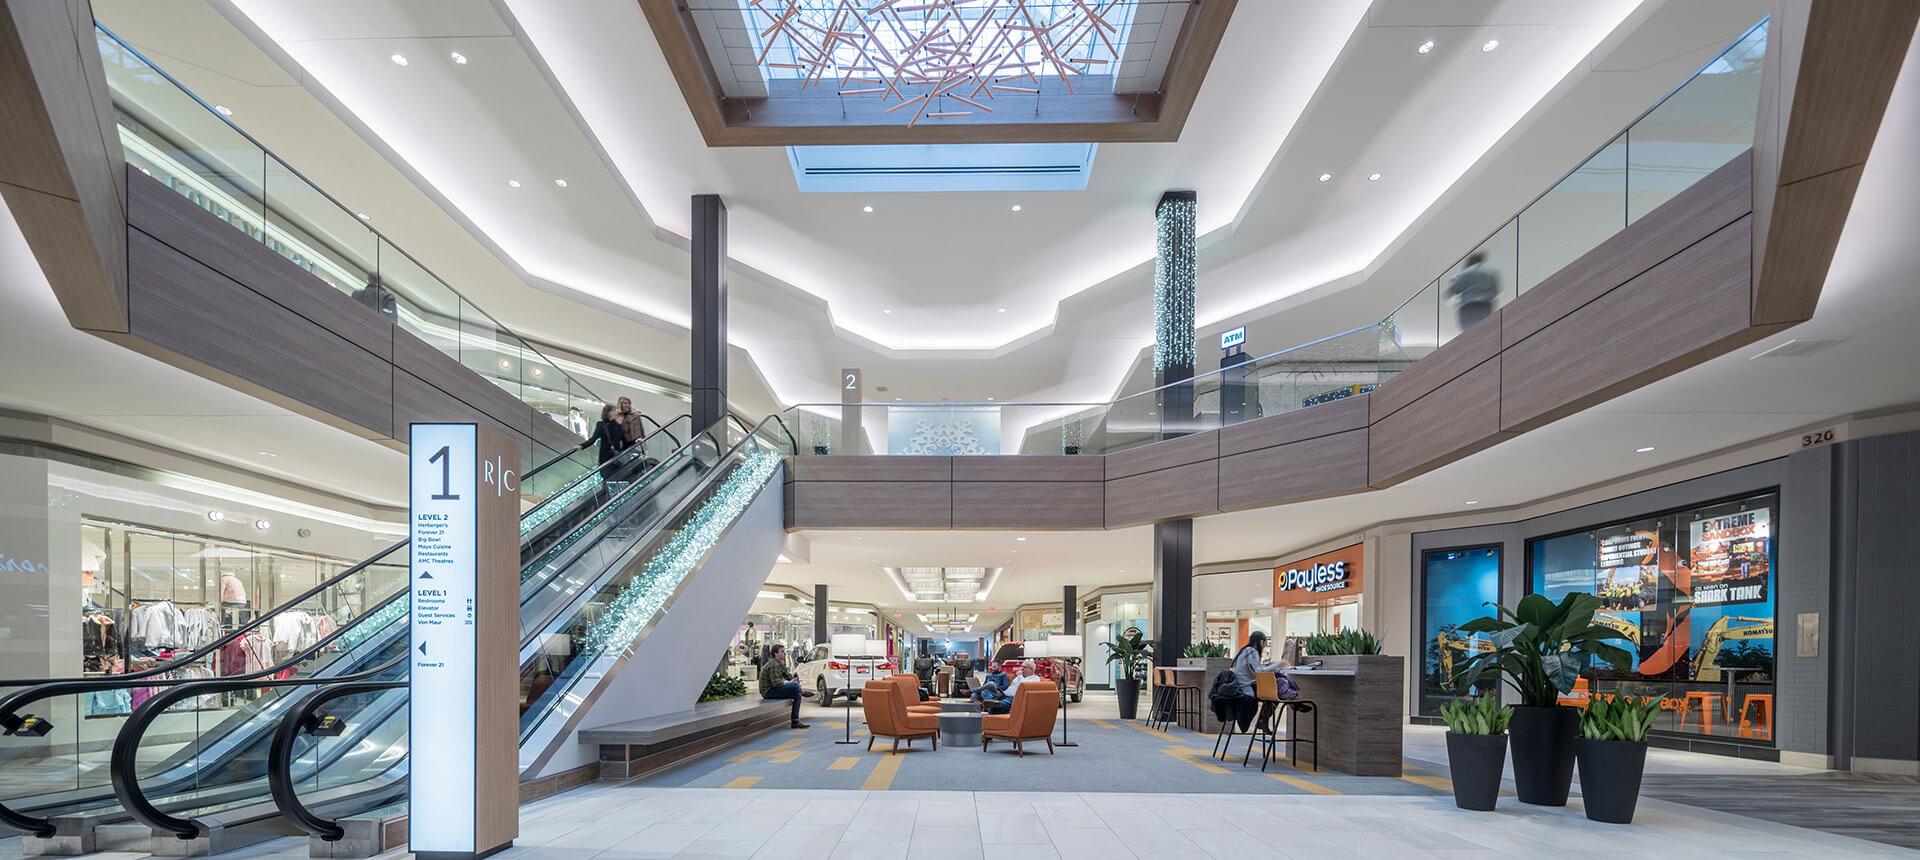 Rosedale Minesota Shopping Mall Lounge